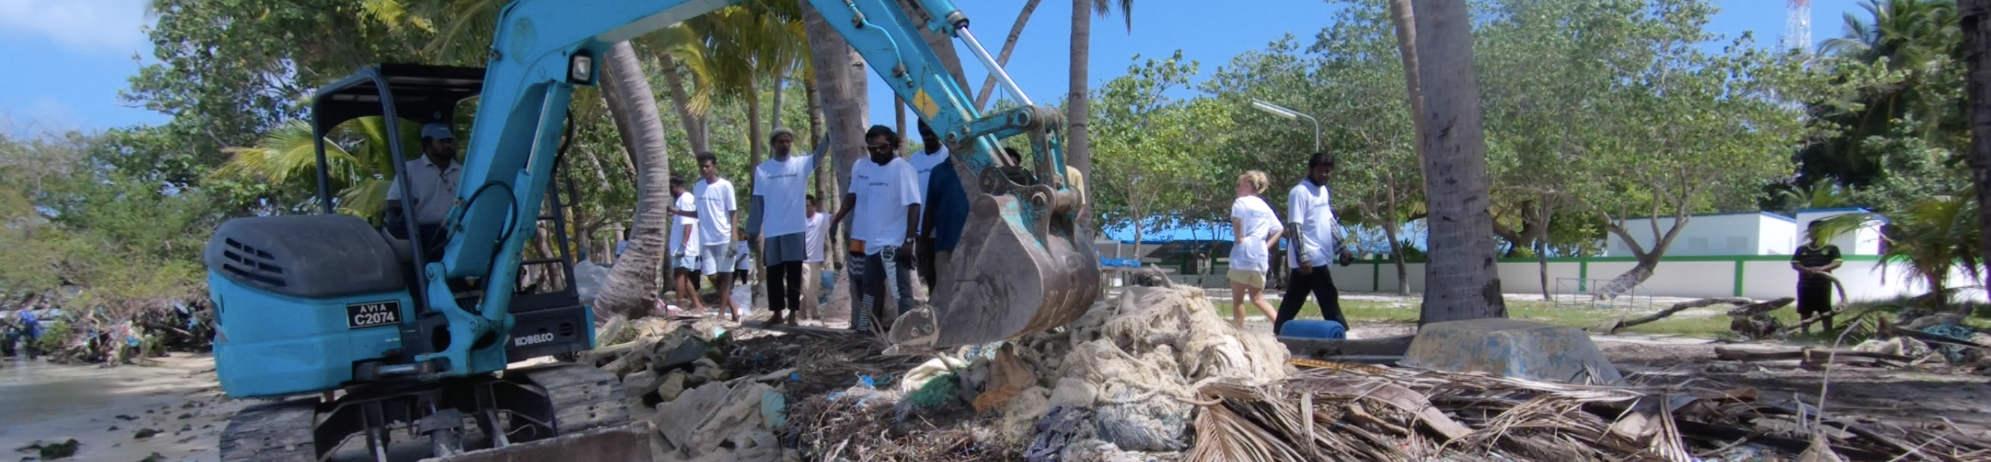 Ozeankind Cooperations Plastic Waste